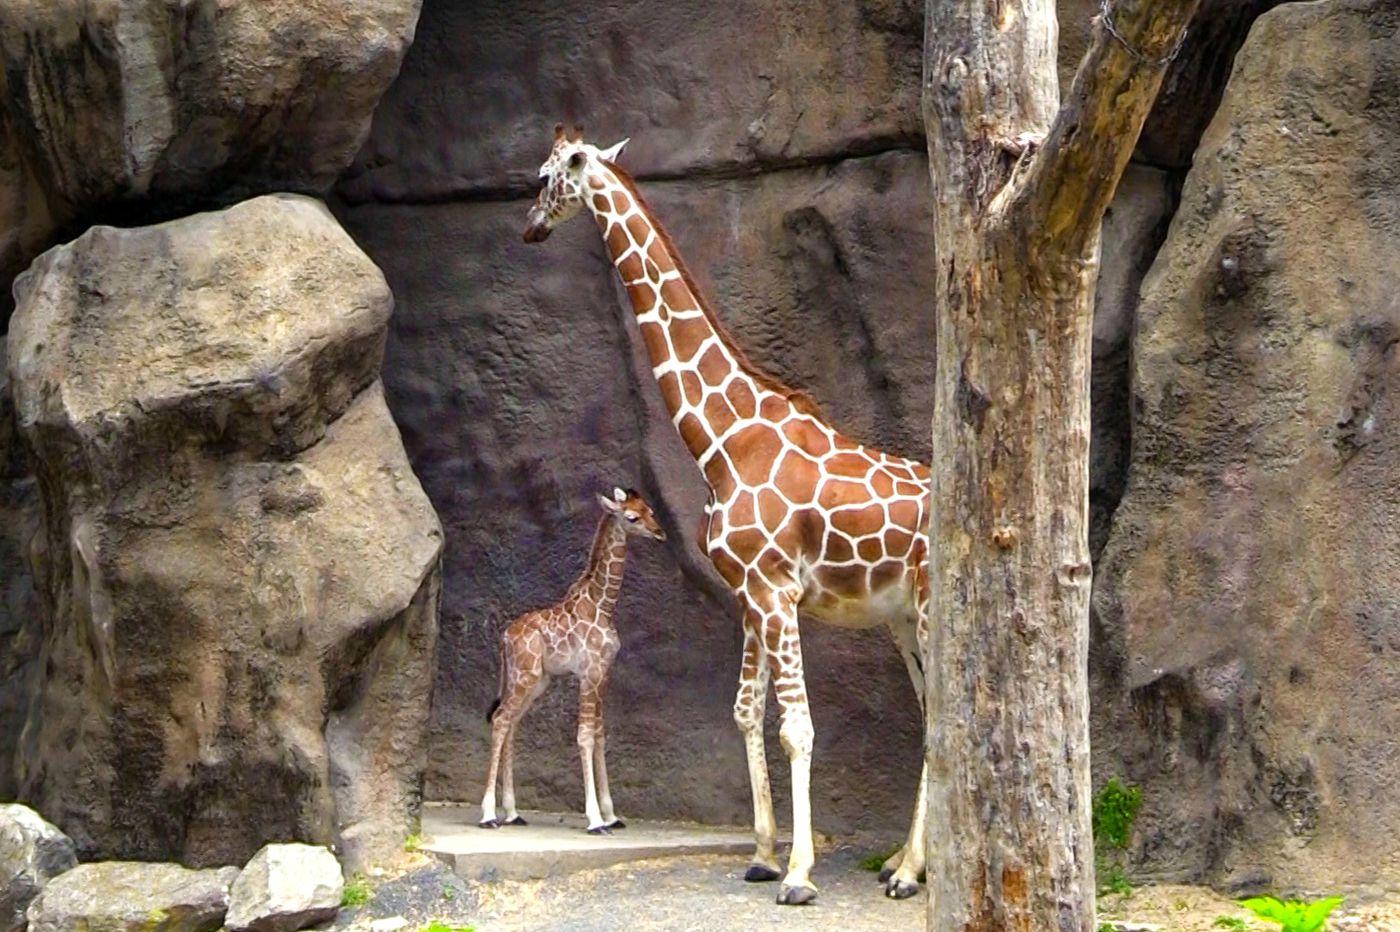 Philadelphia Zoo welcomes newborn giraffe, Beau